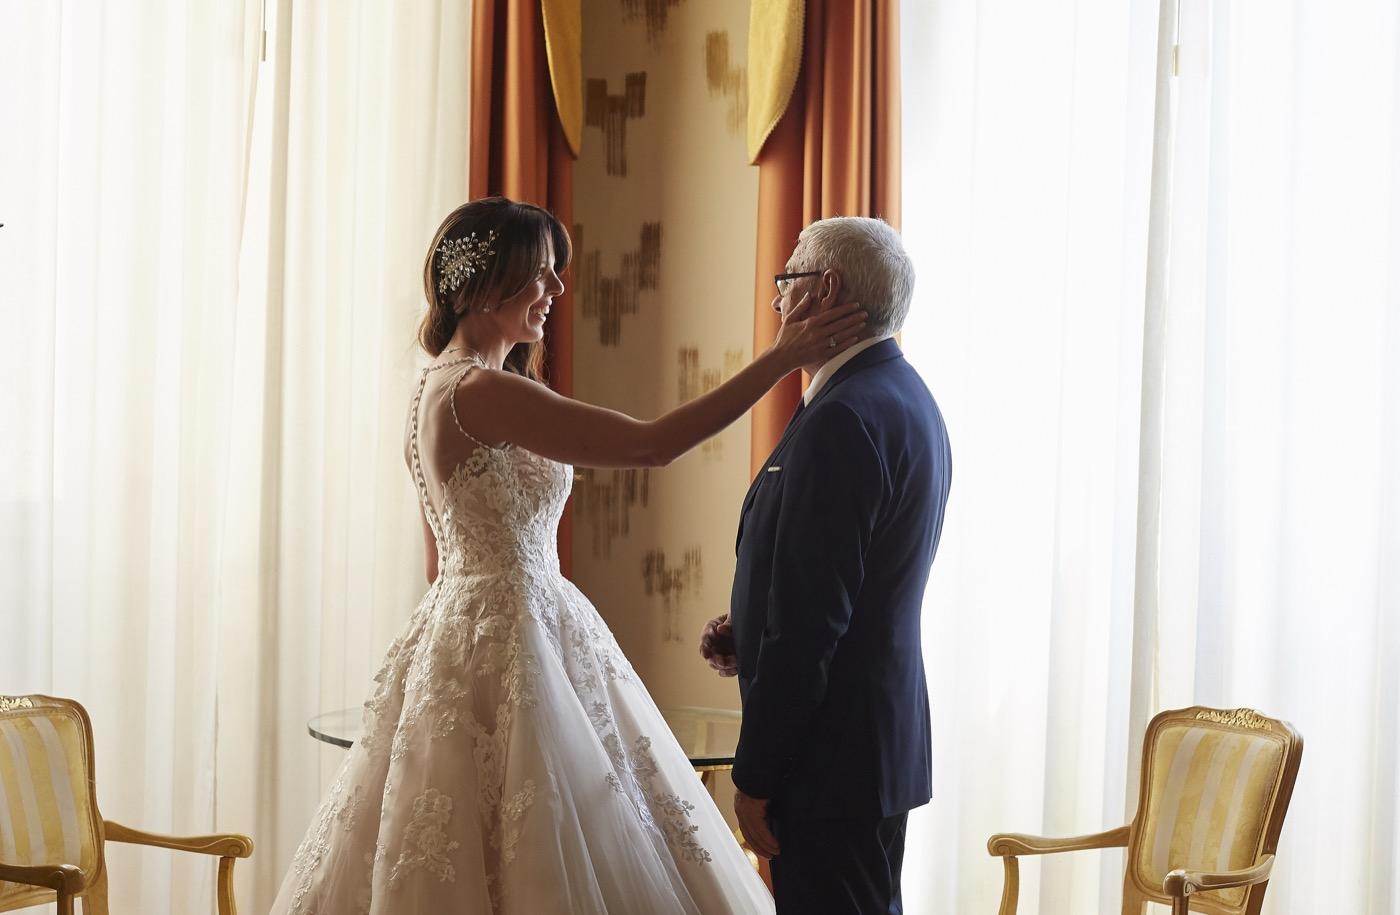 Claudio-Coppola-wedding-photographer-la-scuderia-eventi-preparativi-la-rosetta-perugia-27